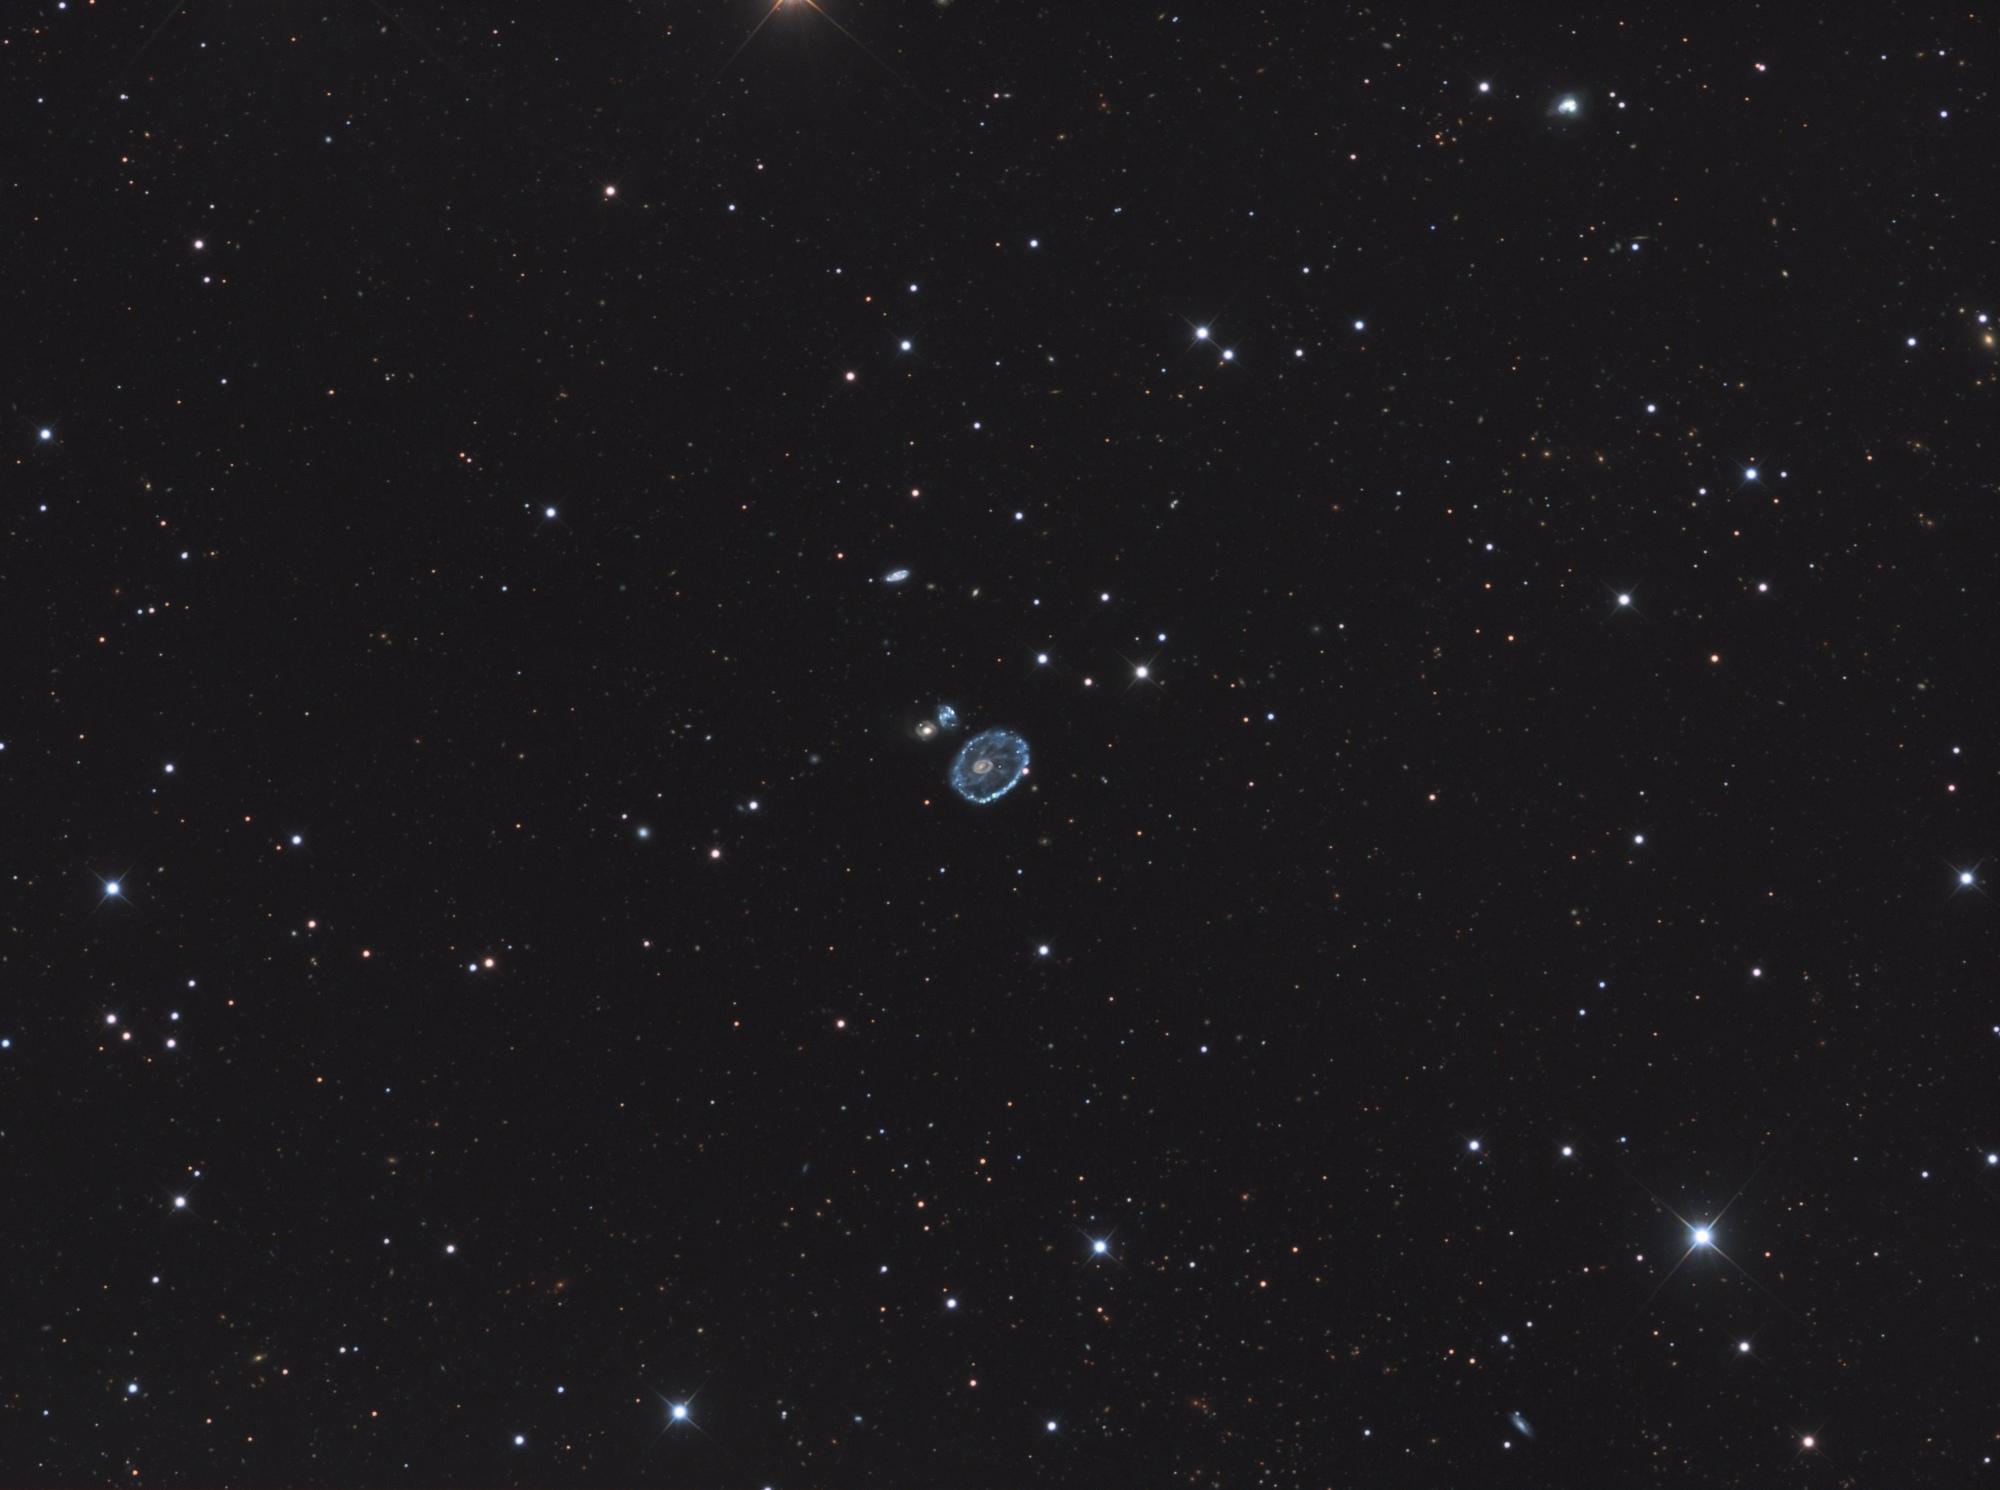 ESO350-40-LRVB-V3-Publi.thumb.jpg.ab7f4ae2c2f1df5789d5e9f1dadd9aa6.jpg